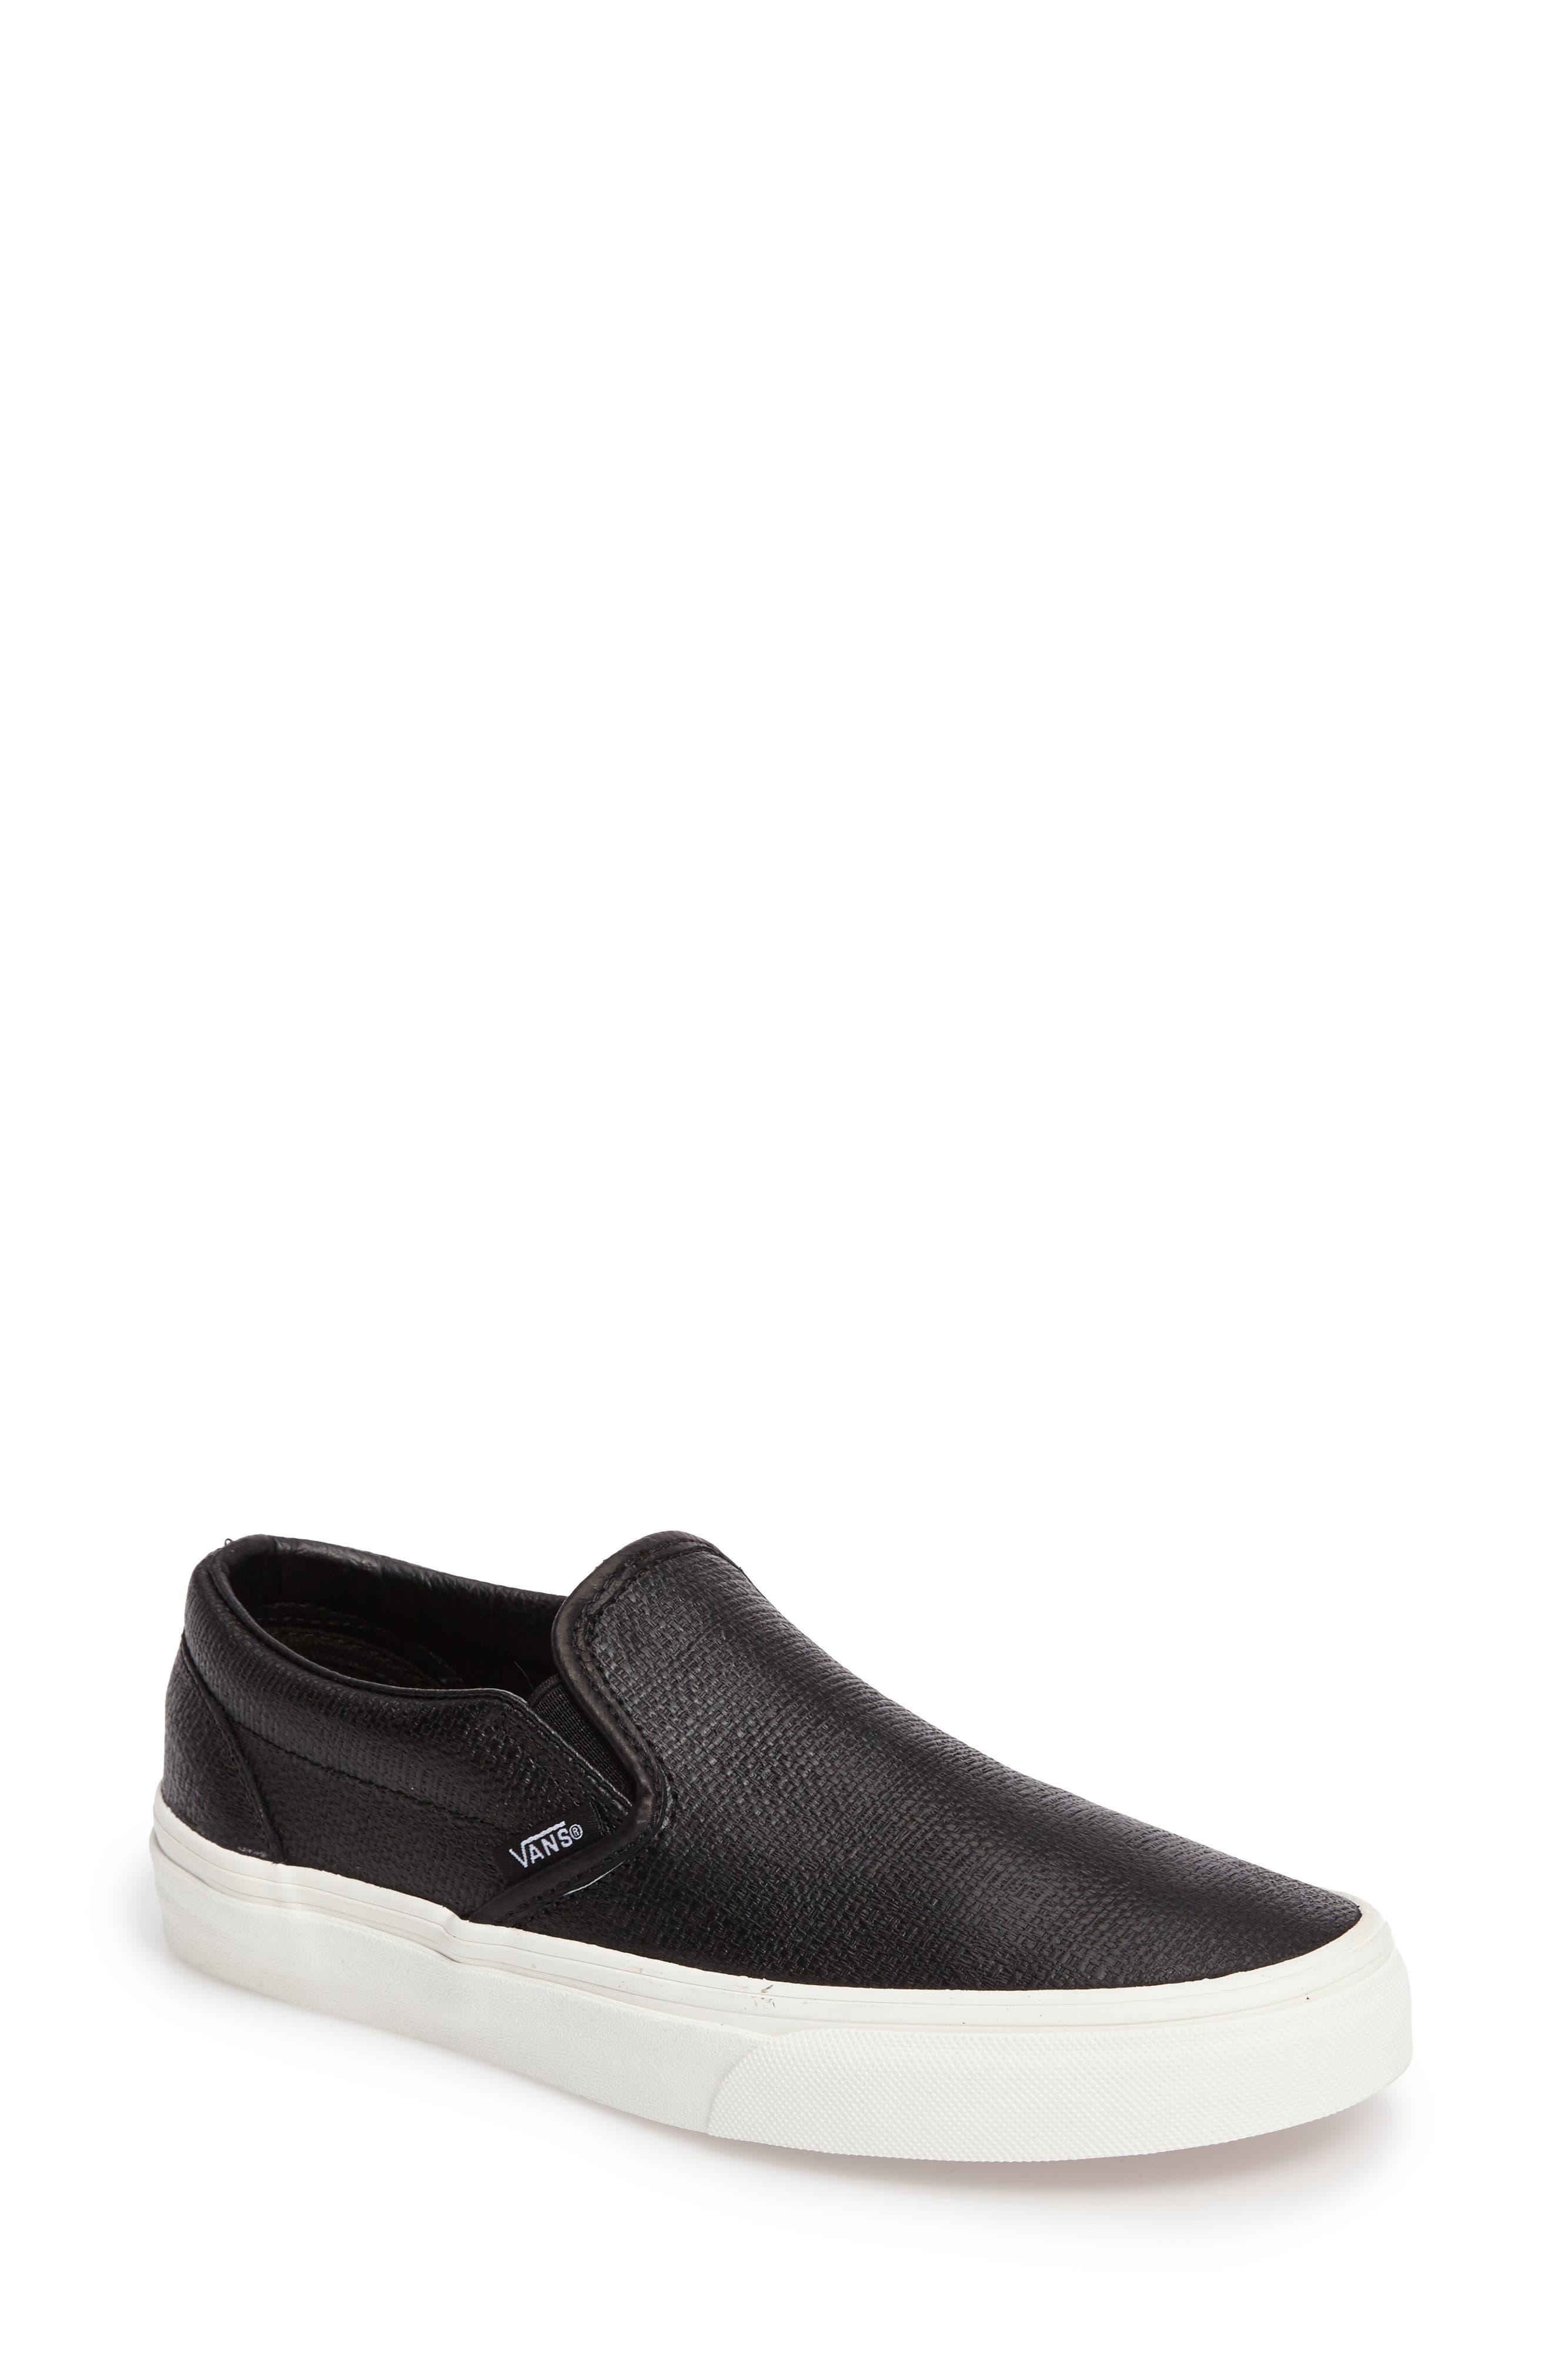 Alternate Image 1 Selected - Vans Glacie Textured Sneaker (Women)